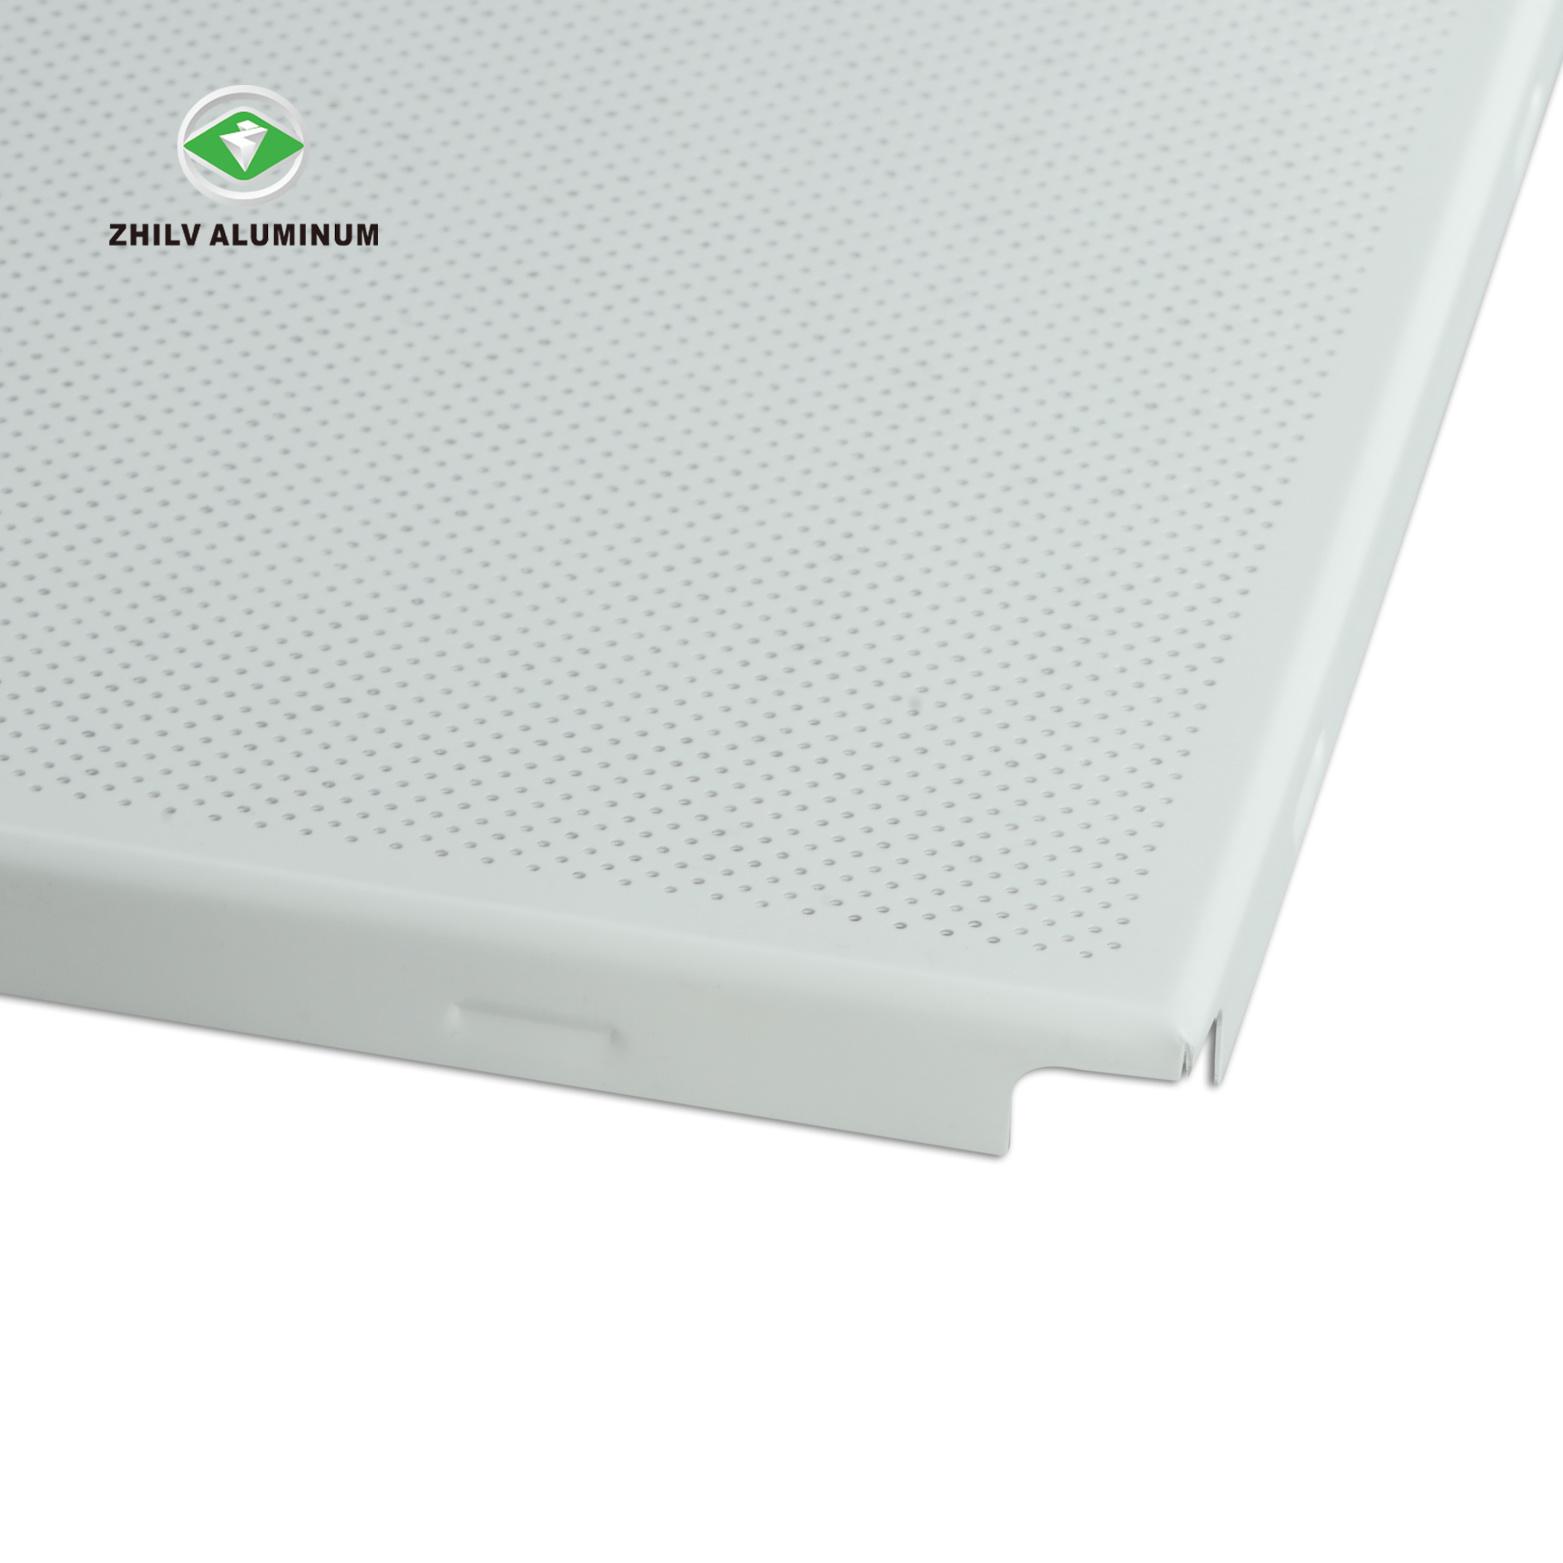 Hot Soundproof Aluminum Metal False Ceiling Panel For Office